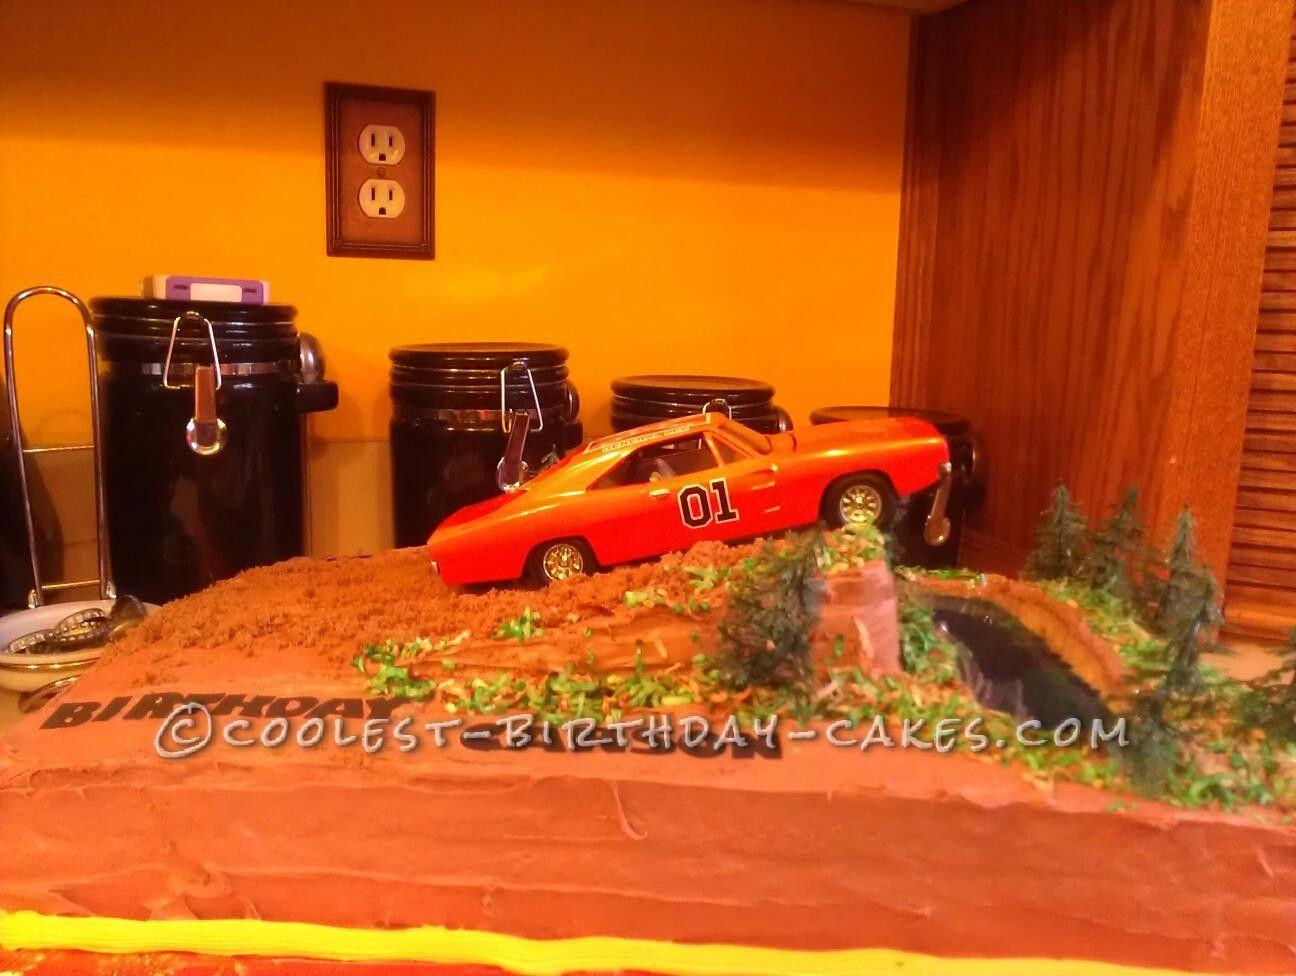 Dukes Of Hazzard Birthday Cake This Website Is The Pinterest Cakes